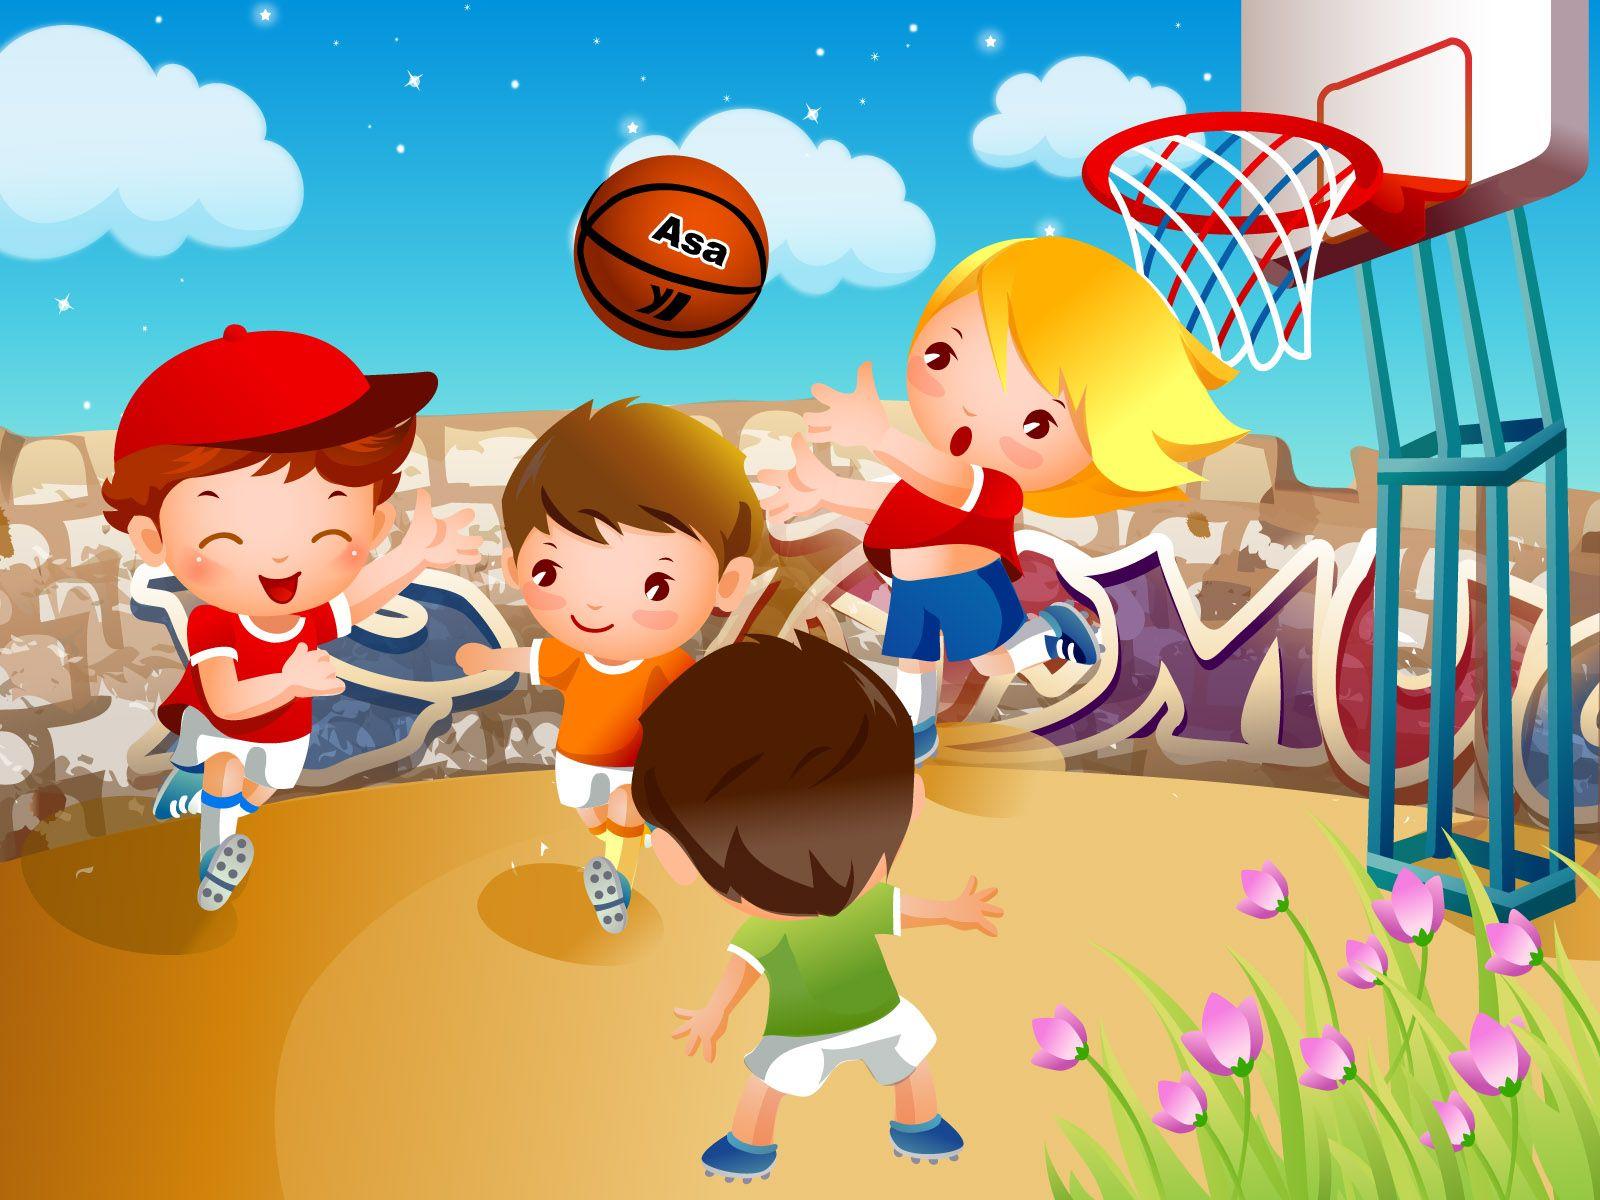 Cartoon Childhood Dream 21660 Fairy Tales Illustration Cartoon Illustration Fun Snacks For Kids Sports Wallpapers Sports